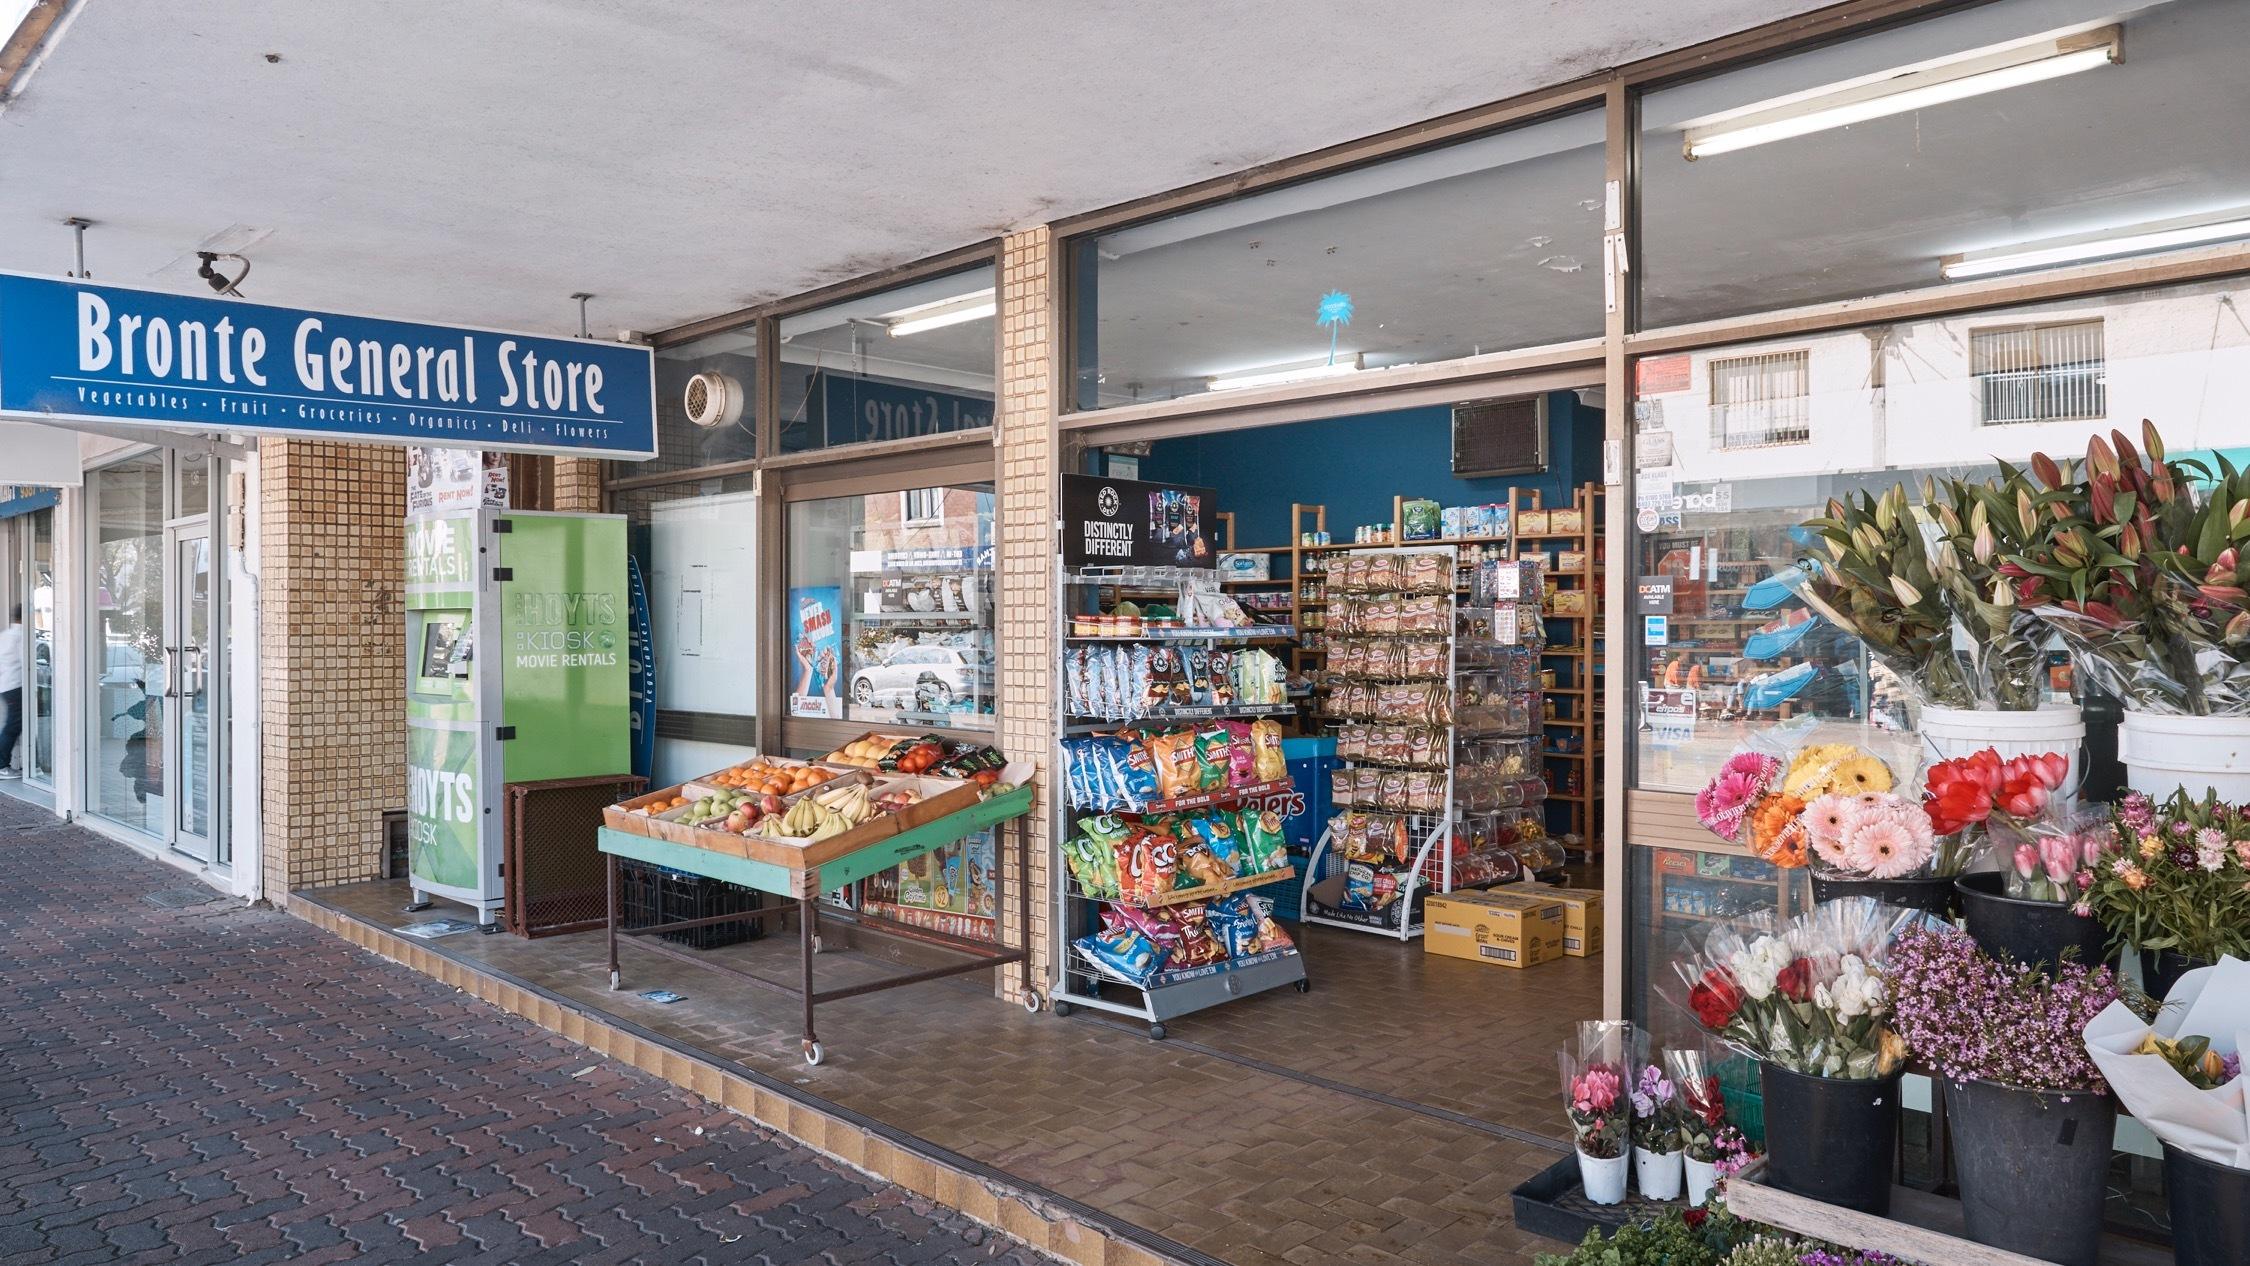 Exterior at Bronte General Store